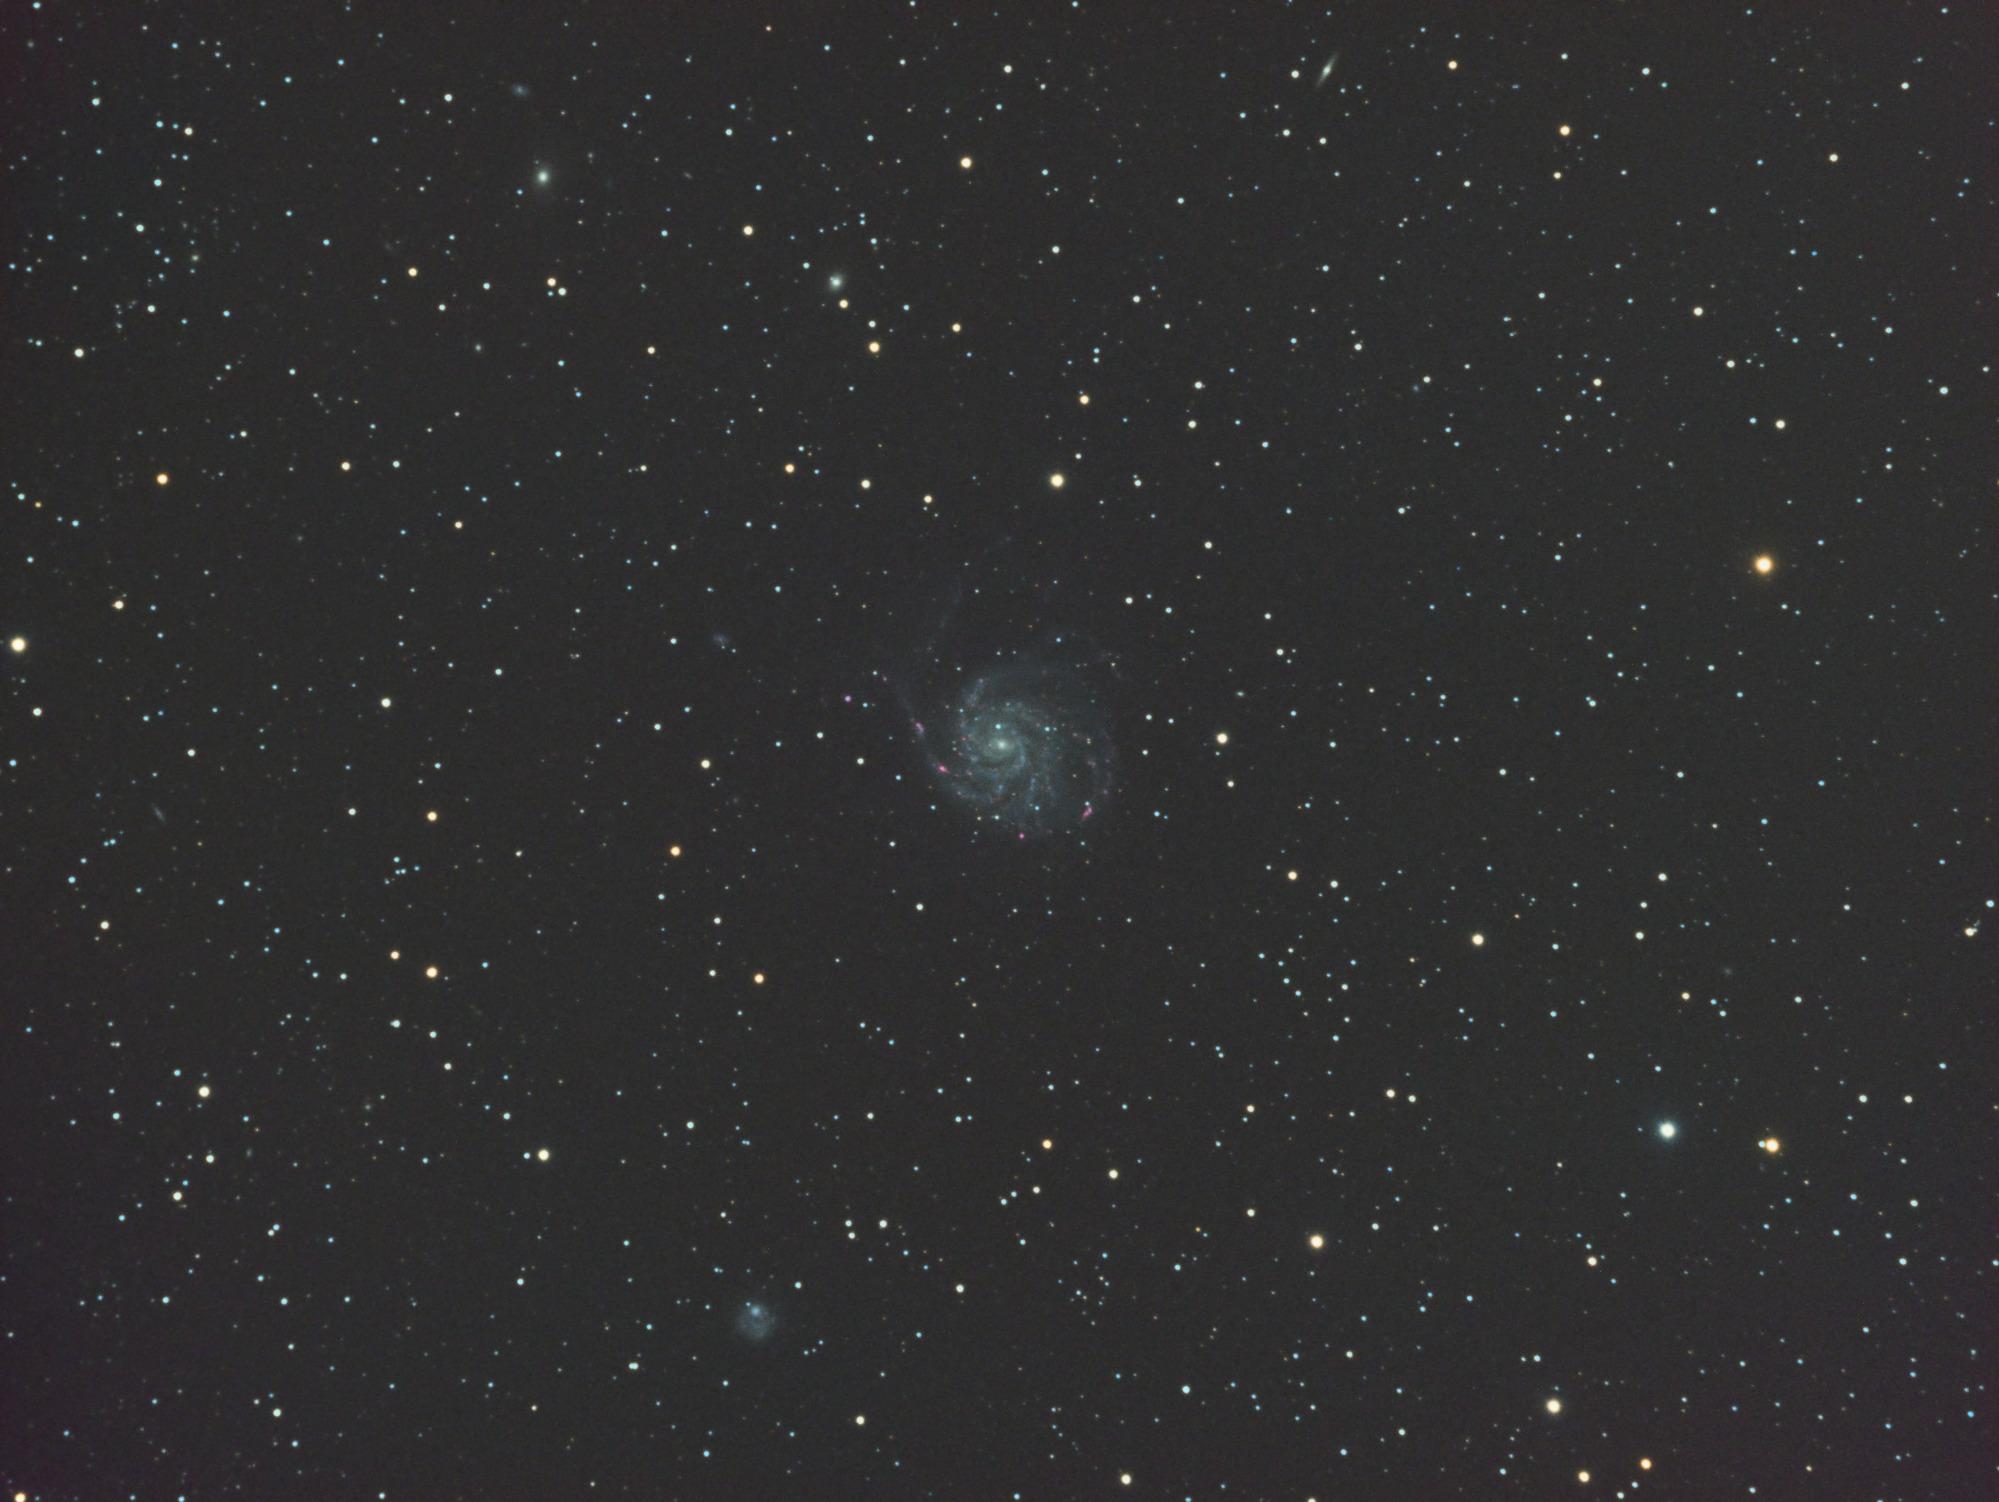 2019-05-10-M101-LRGBHa-crop-dbe-bn-scnr-mlt-ht-tgvd-hdrmt-ct-dbe.jpg